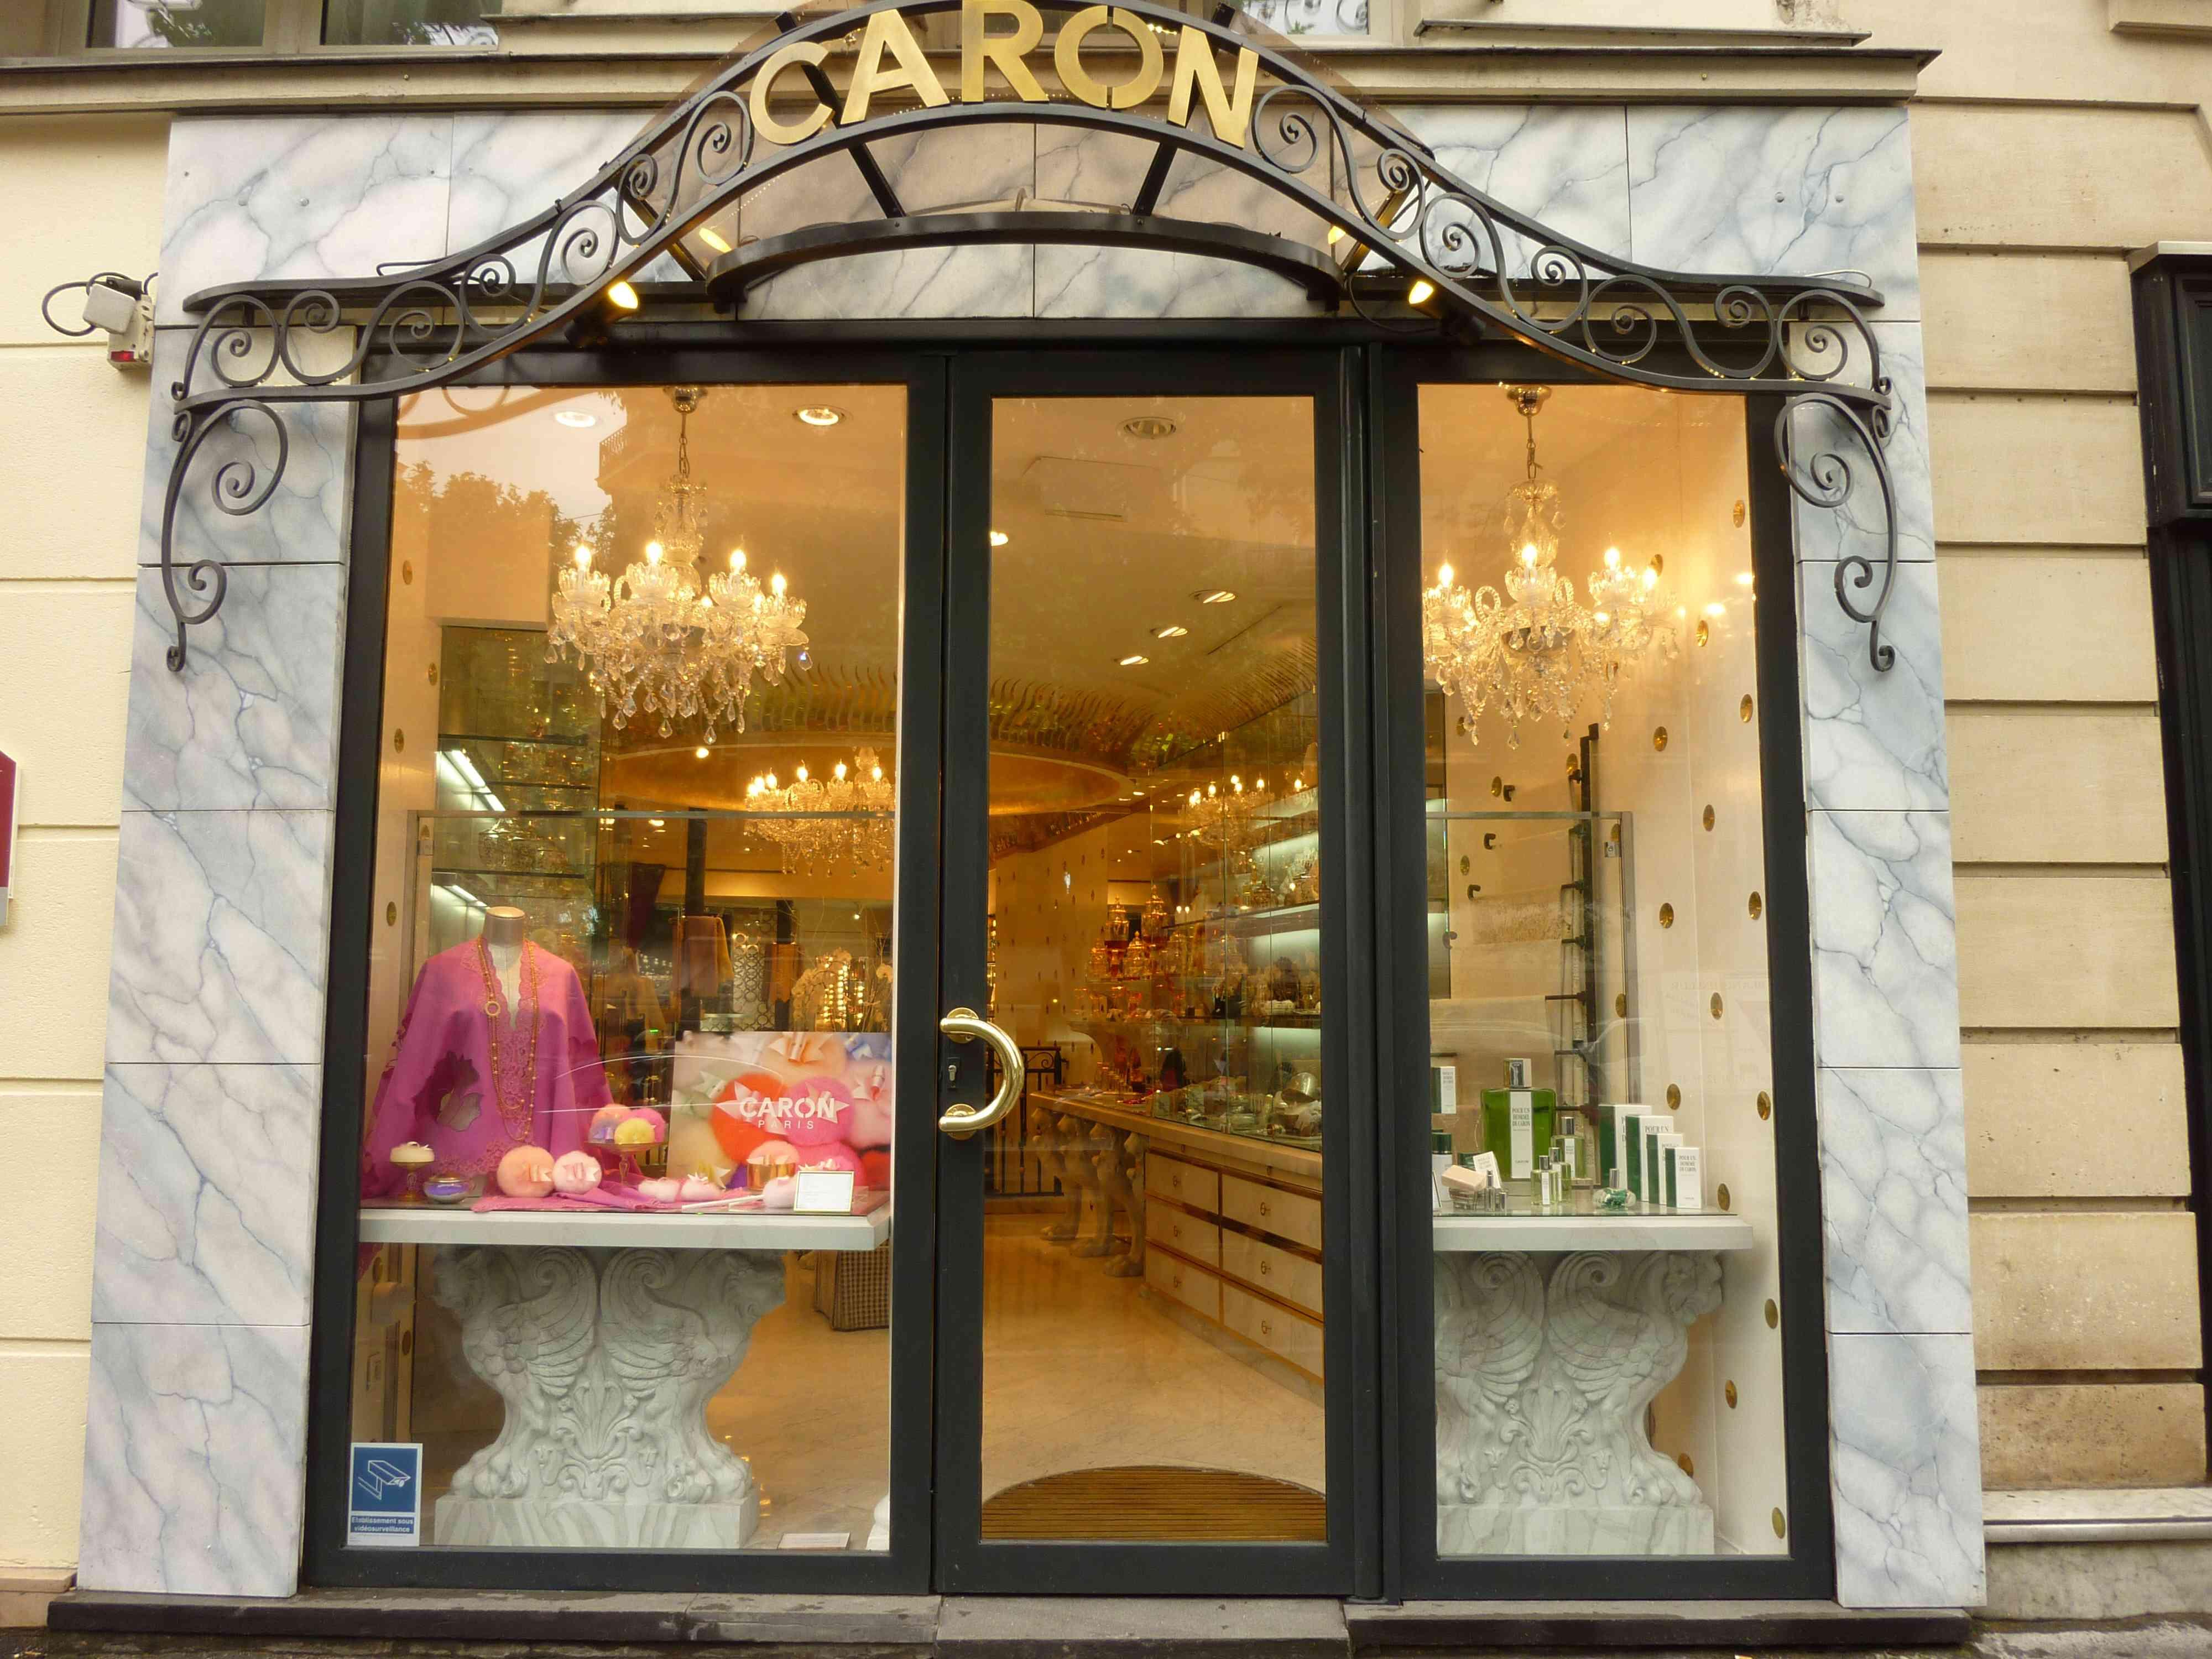 Caron perfume shop in Saint-Germain, Paris